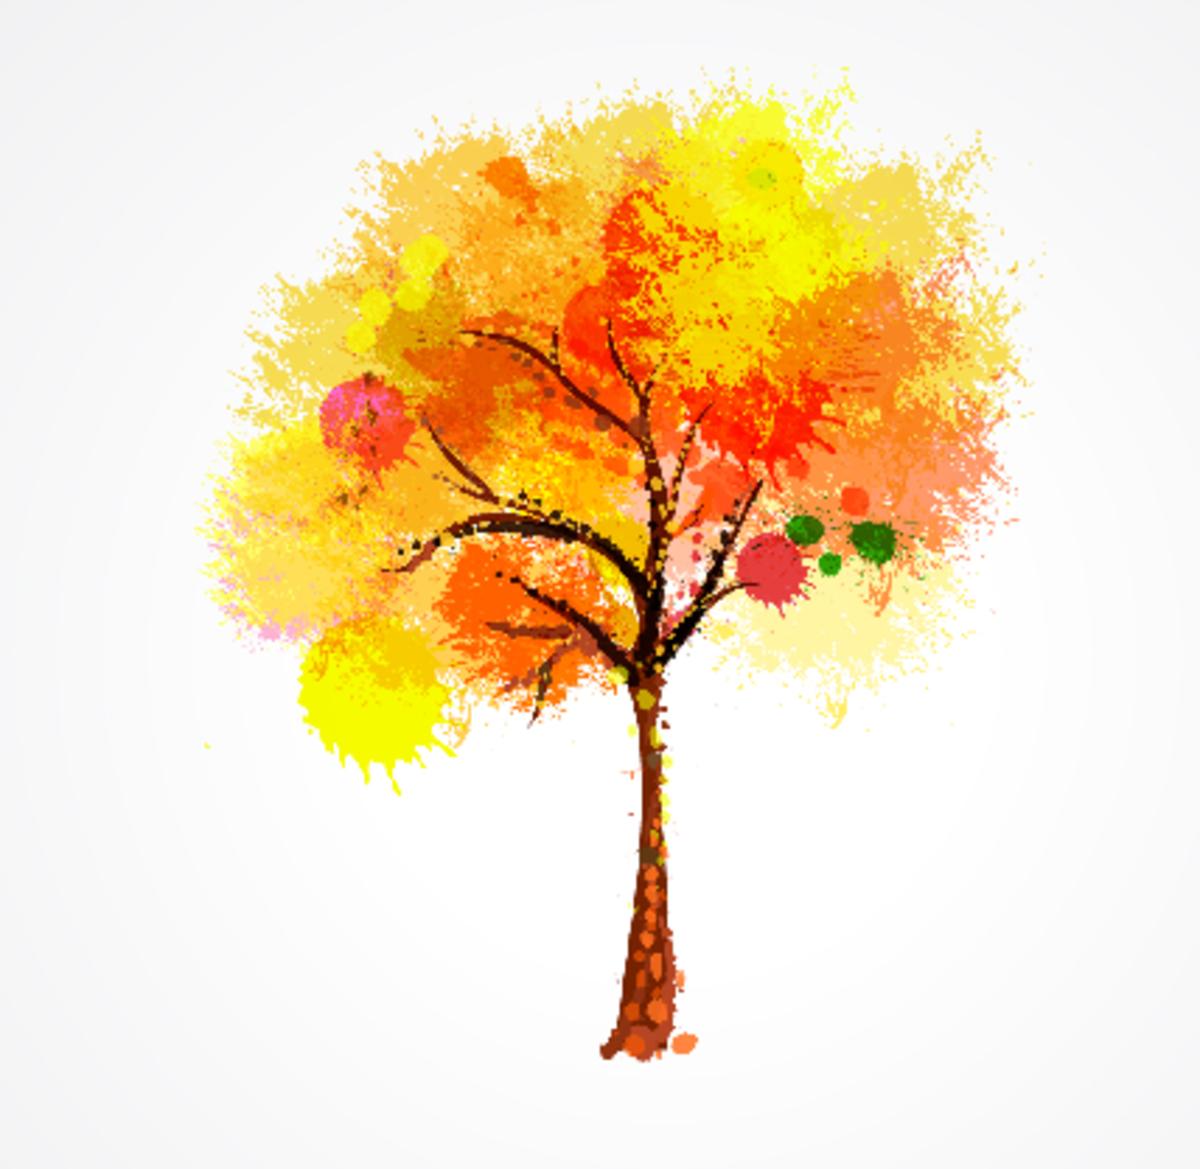 Artistic Autumn Tree